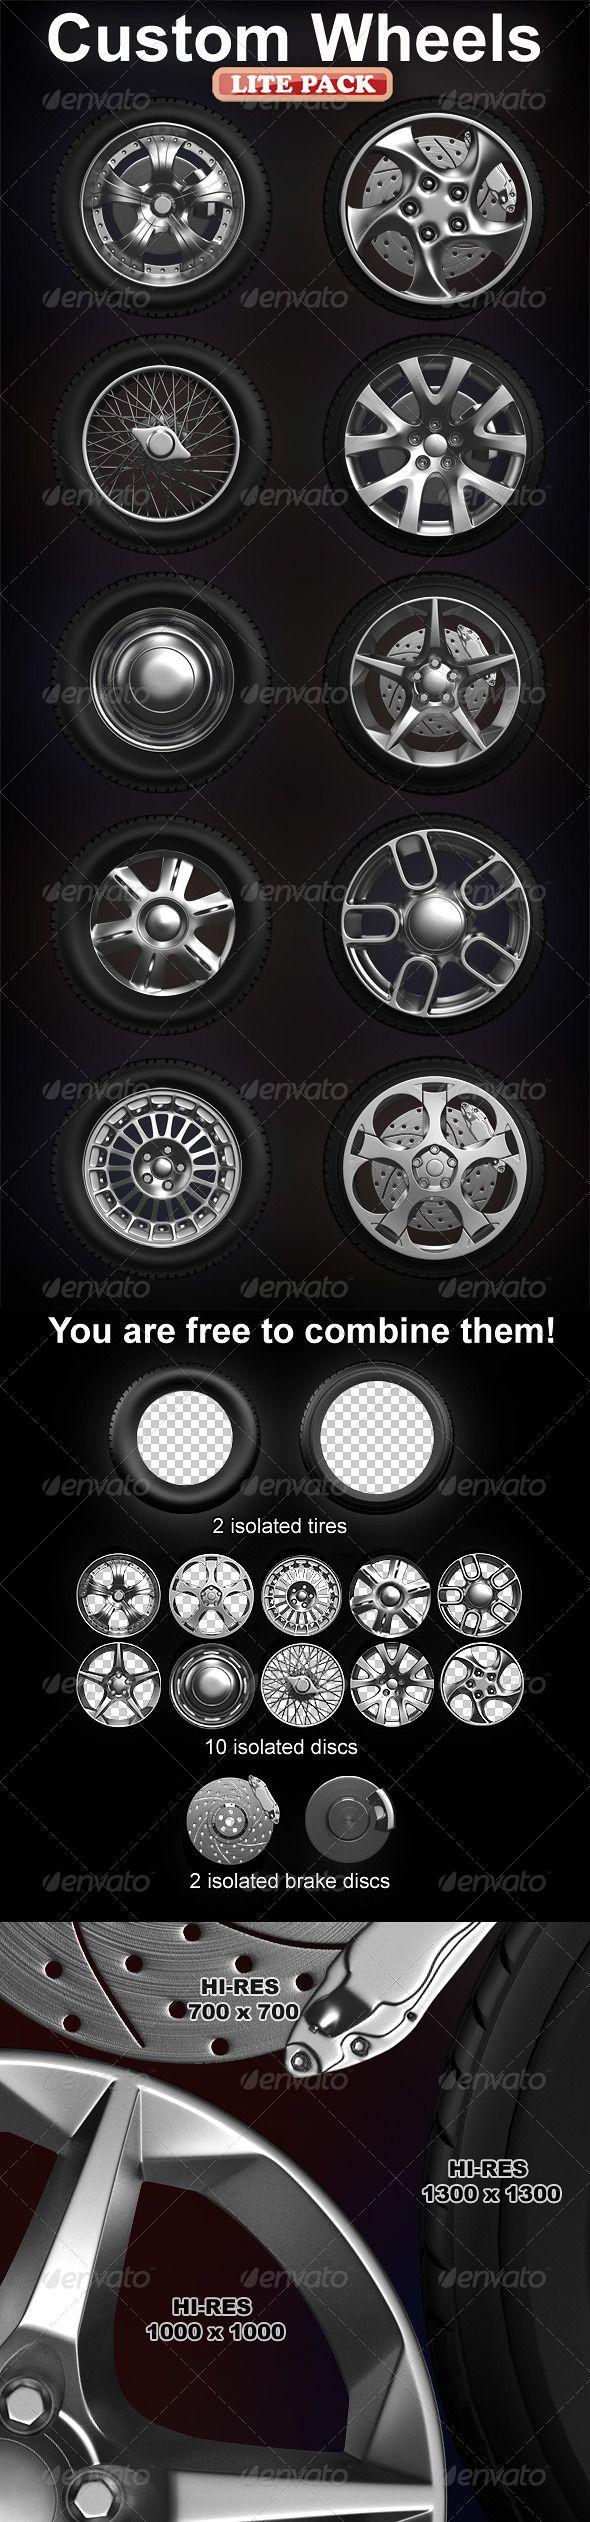 Isolated custom wheels pack (2 tires, 10 discs)